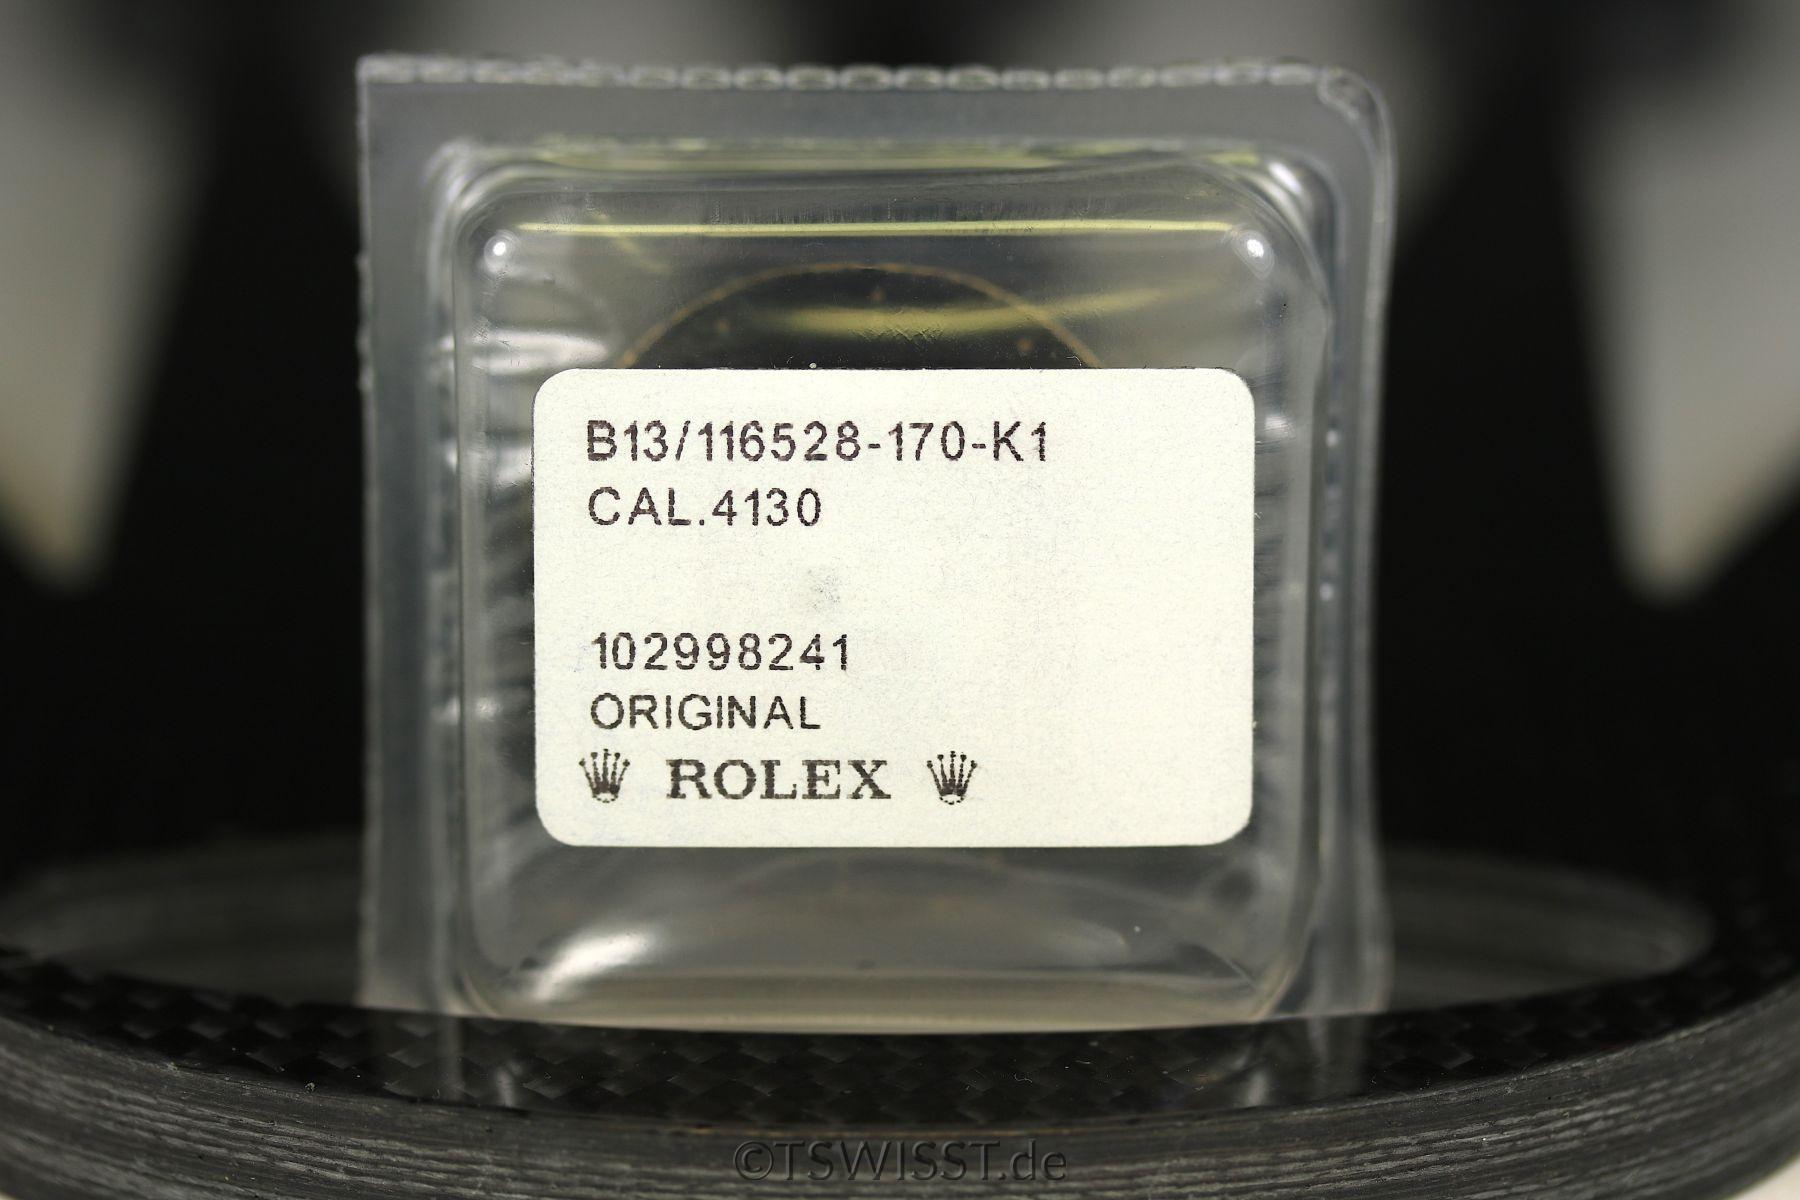 Rolex Daytona dial and hands